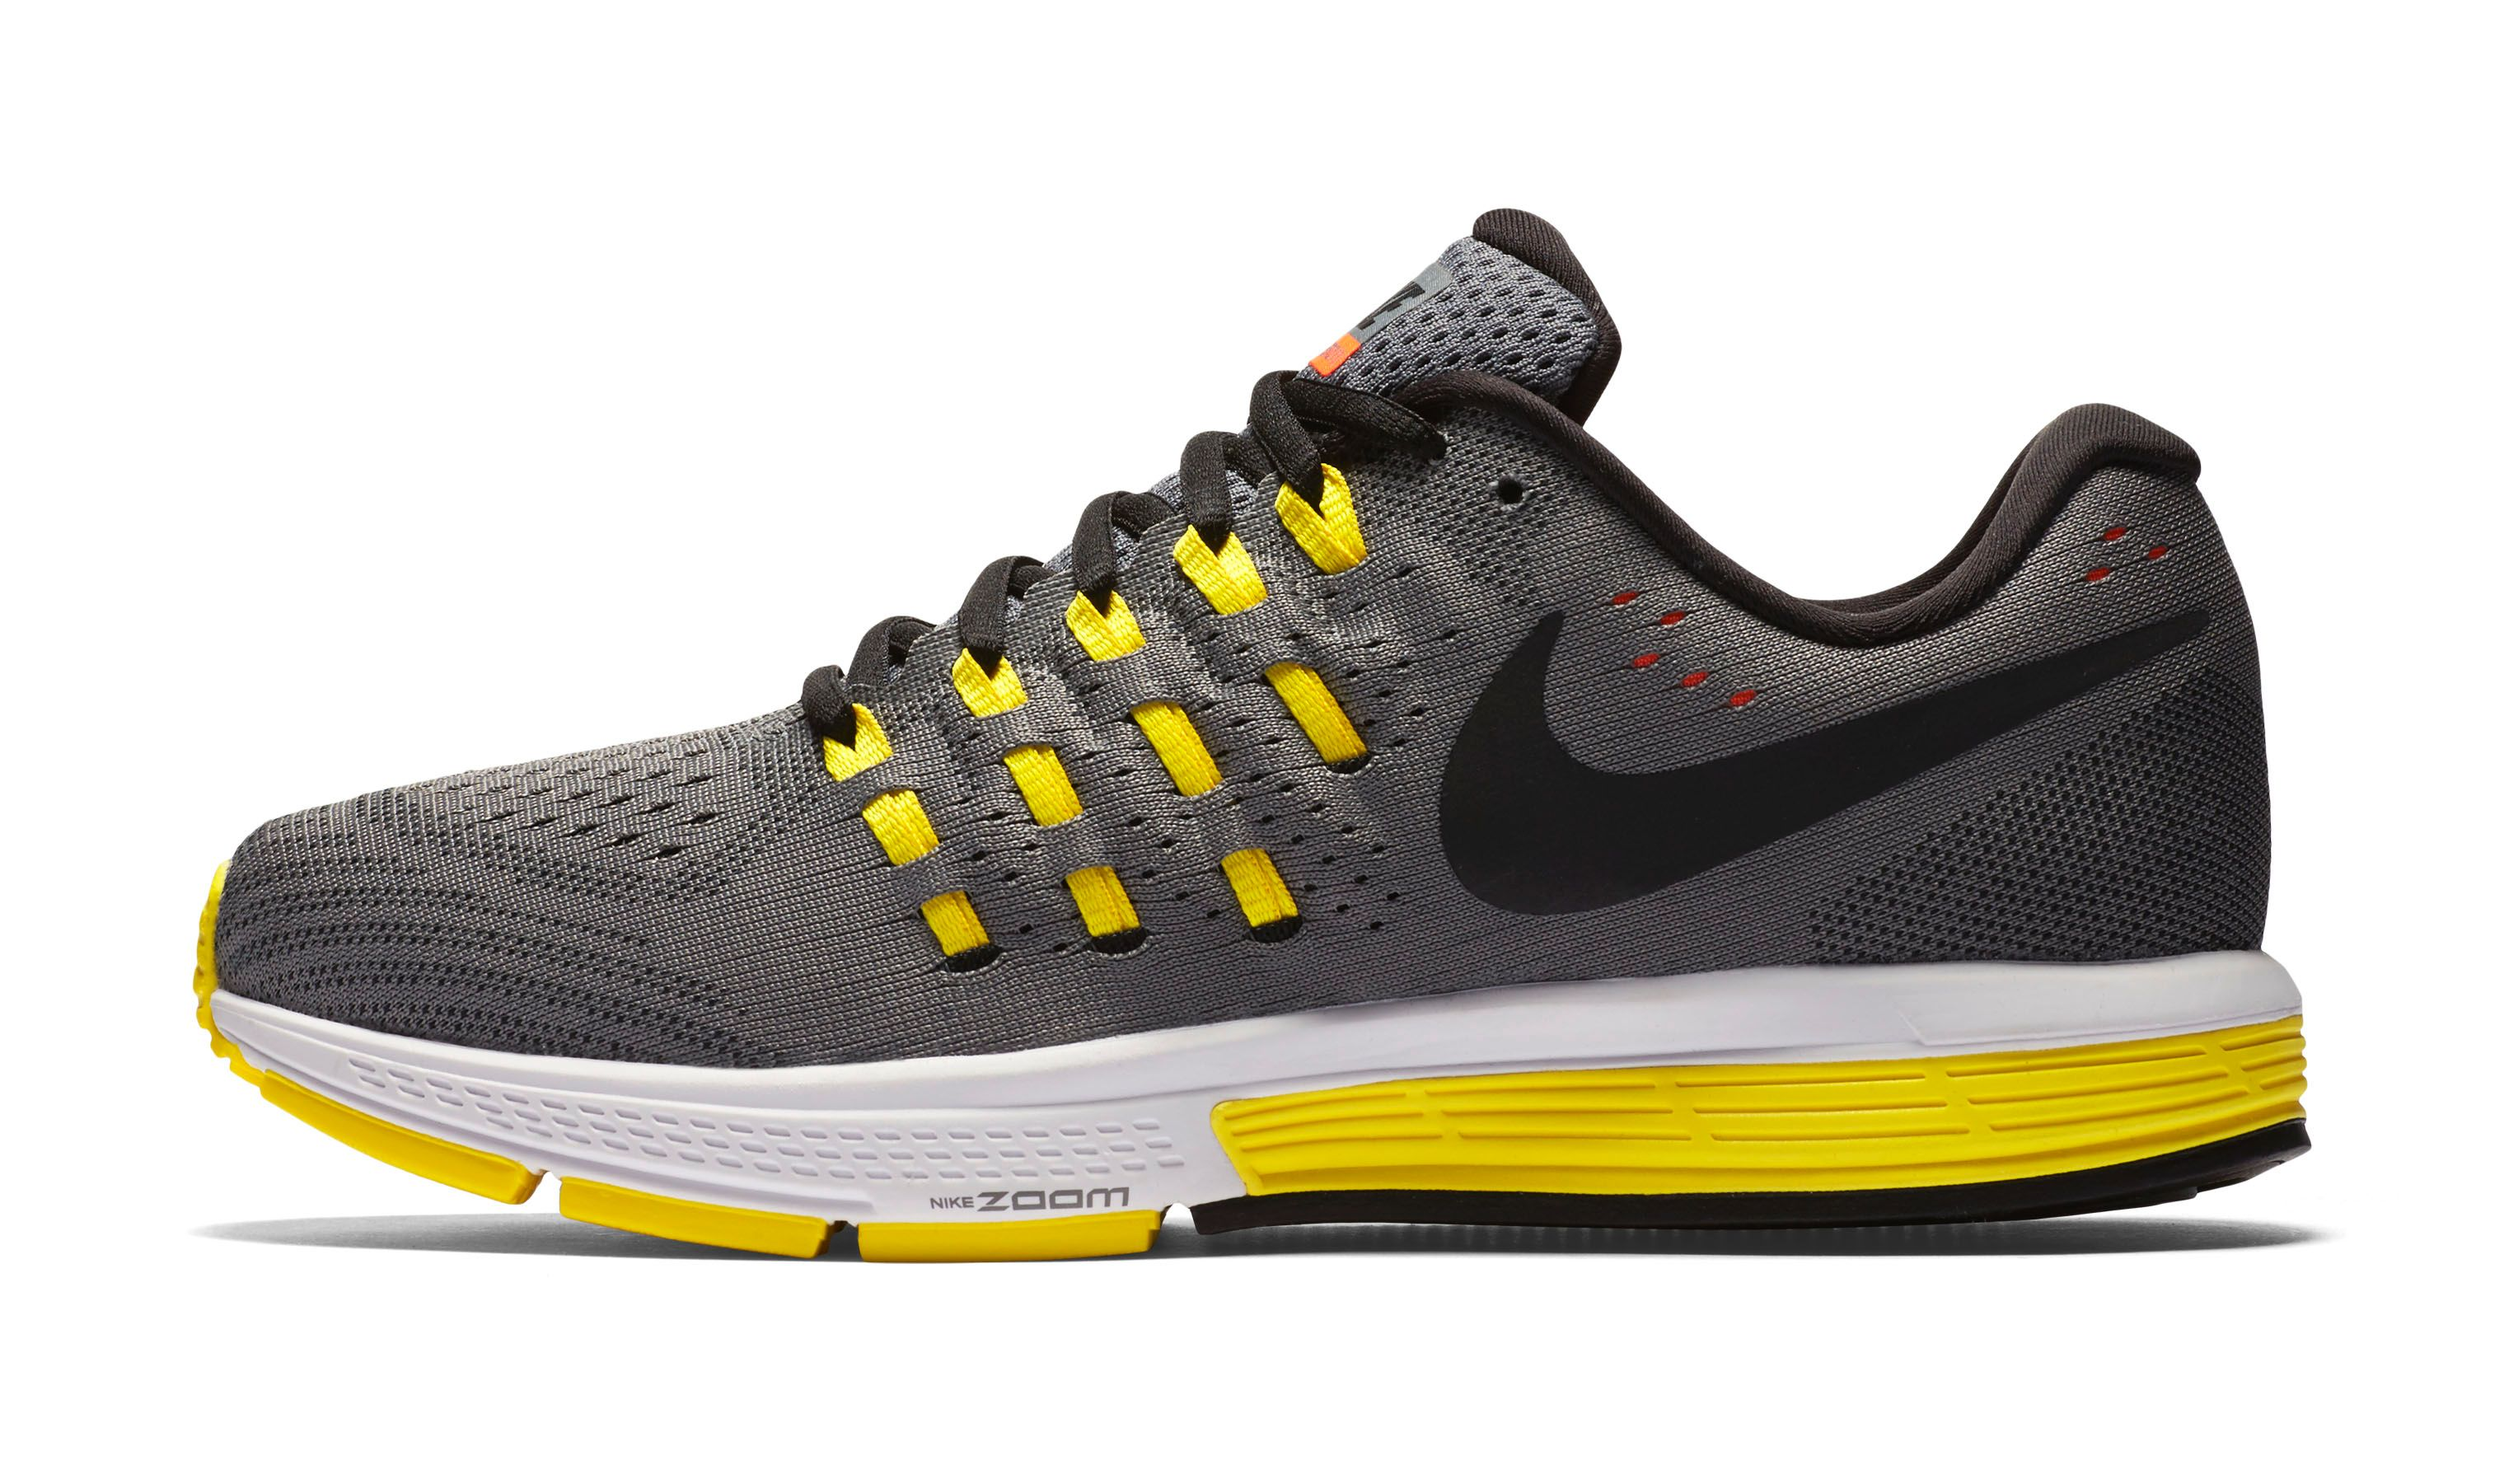 Nike Air Zoom Vomero 11 Dame Sko SortAnthraciteMørkegrå